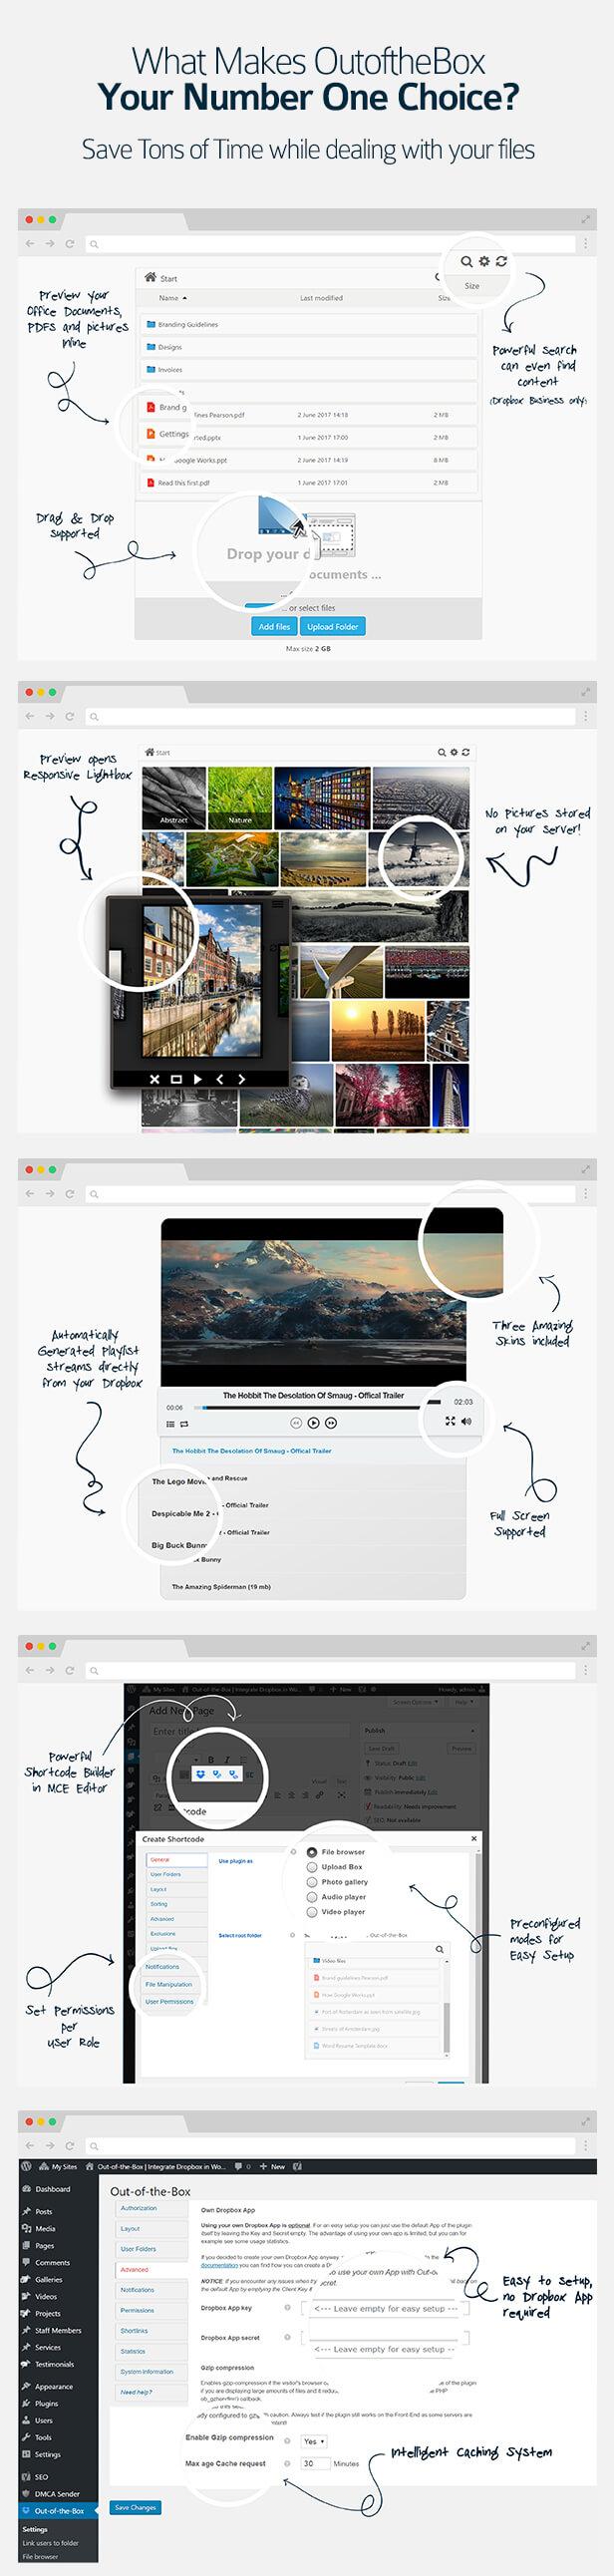 dropbox6 - Out-of-the-Box | Dropbox plugin for WordPress